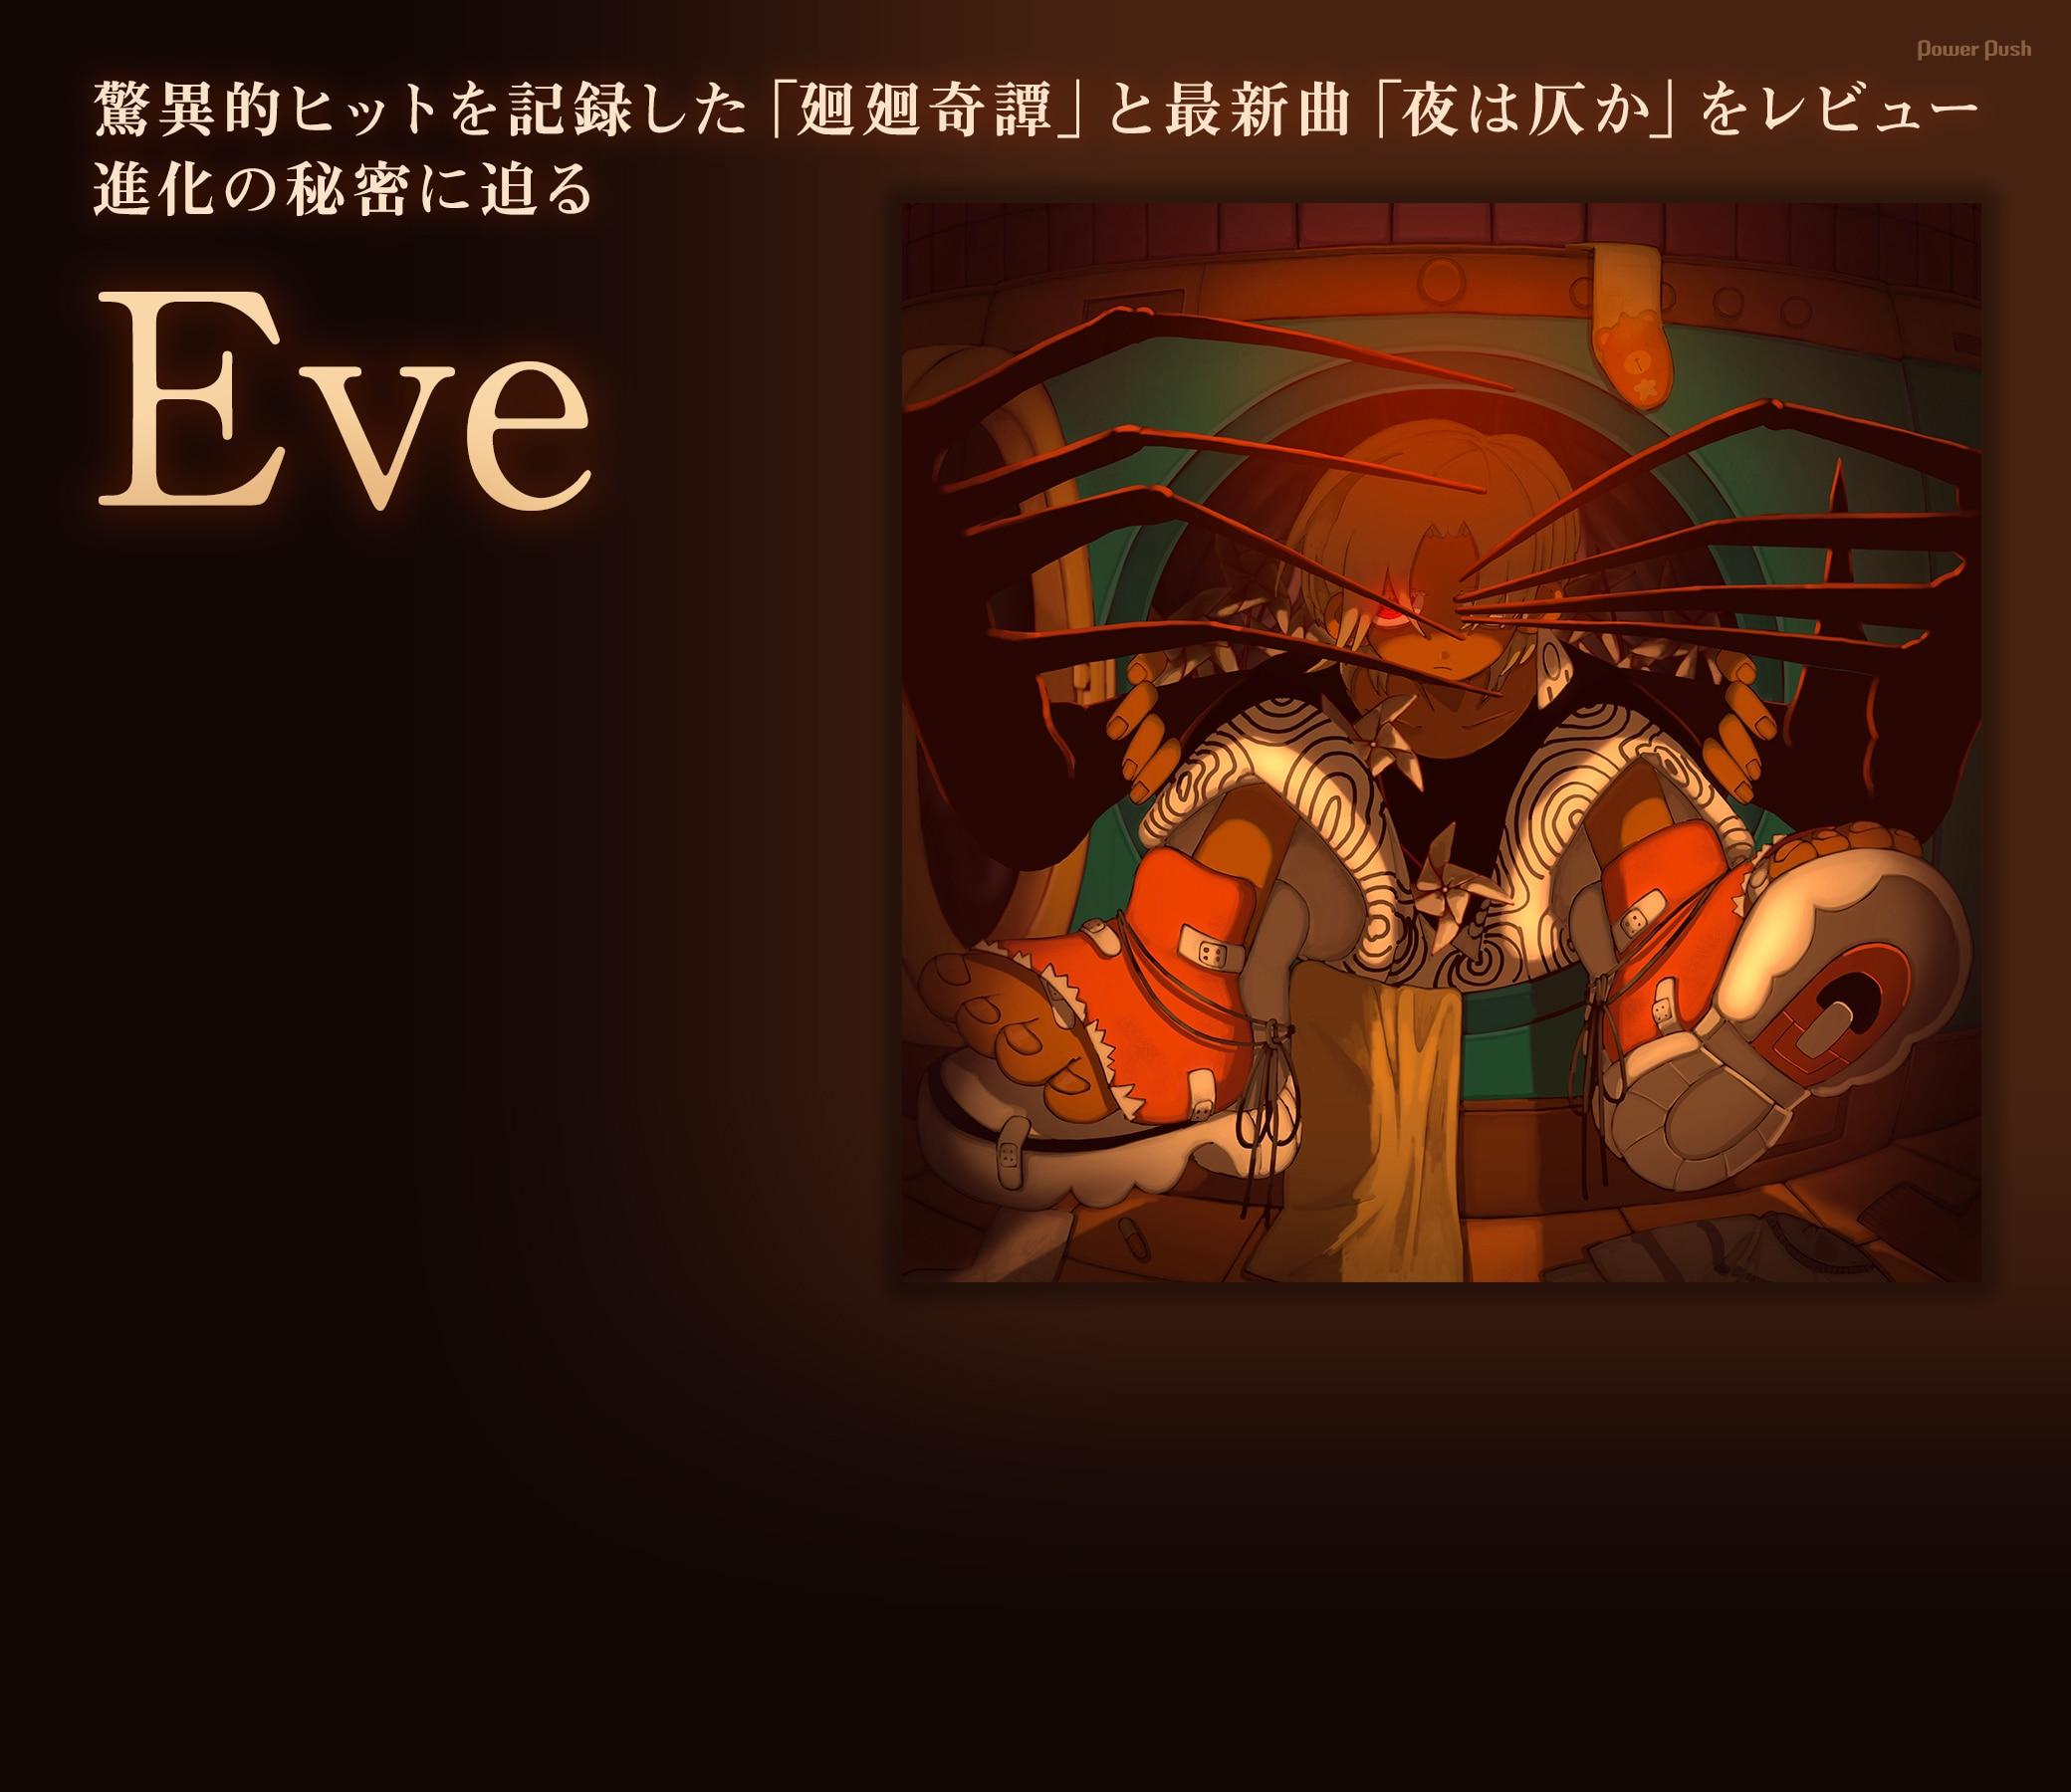 Eve 驚異的ヒットを記録した「廻廻奇譚」と最新曲「夜は仄か」をレビュー 進化の秘密に迫る